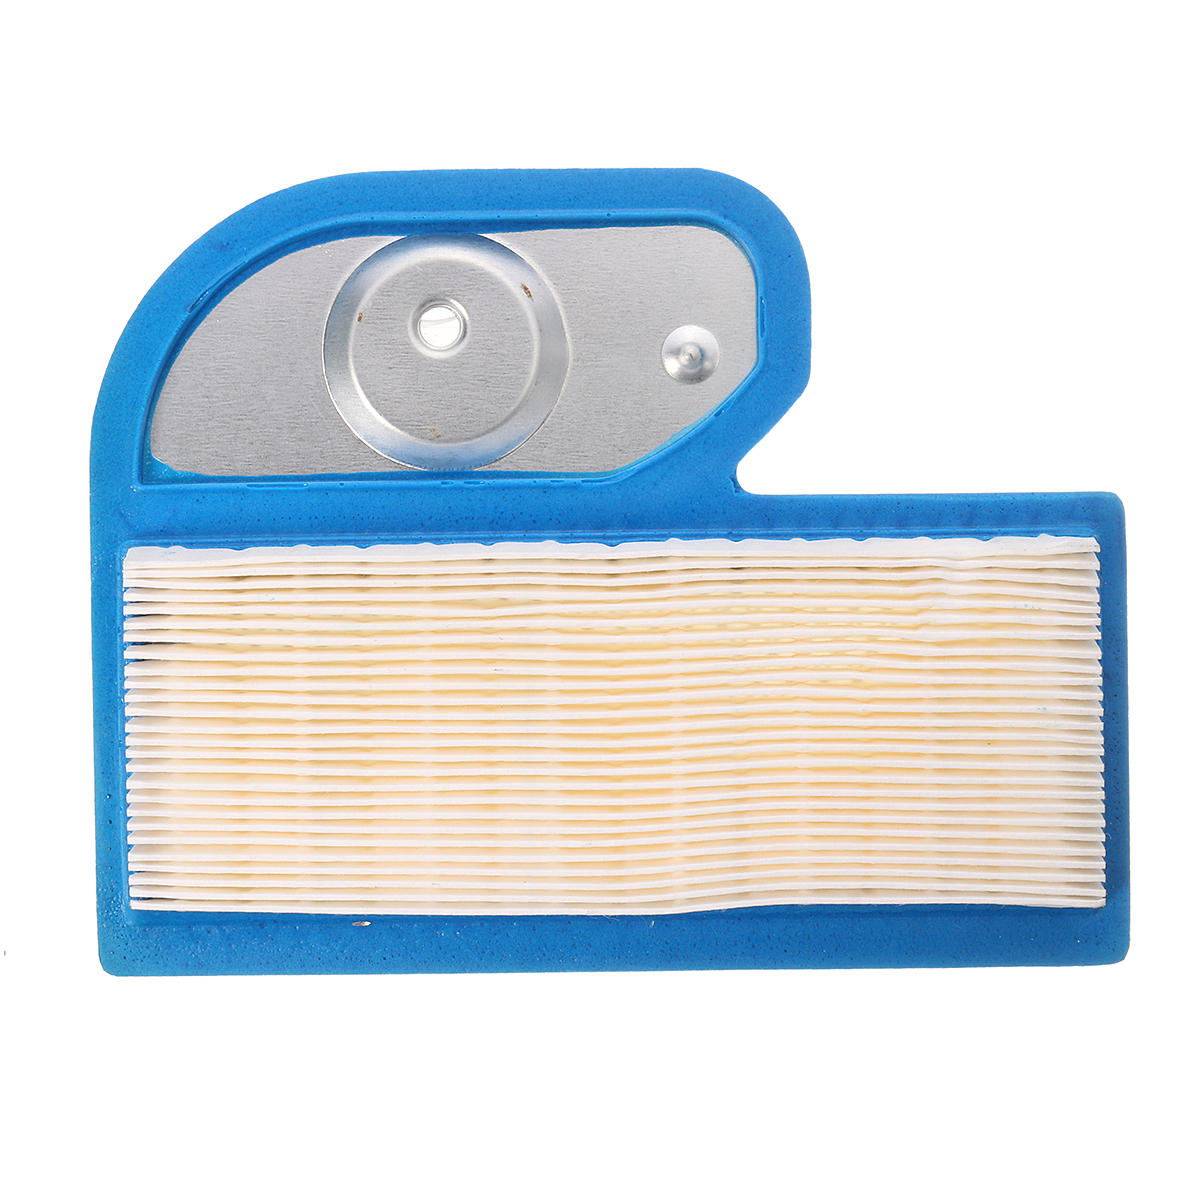 hight resolution of air filter for kawasaki fh451v fh500v fh531 fh580v john deere 17hp engine 11013 7002 sale banggood com sold out